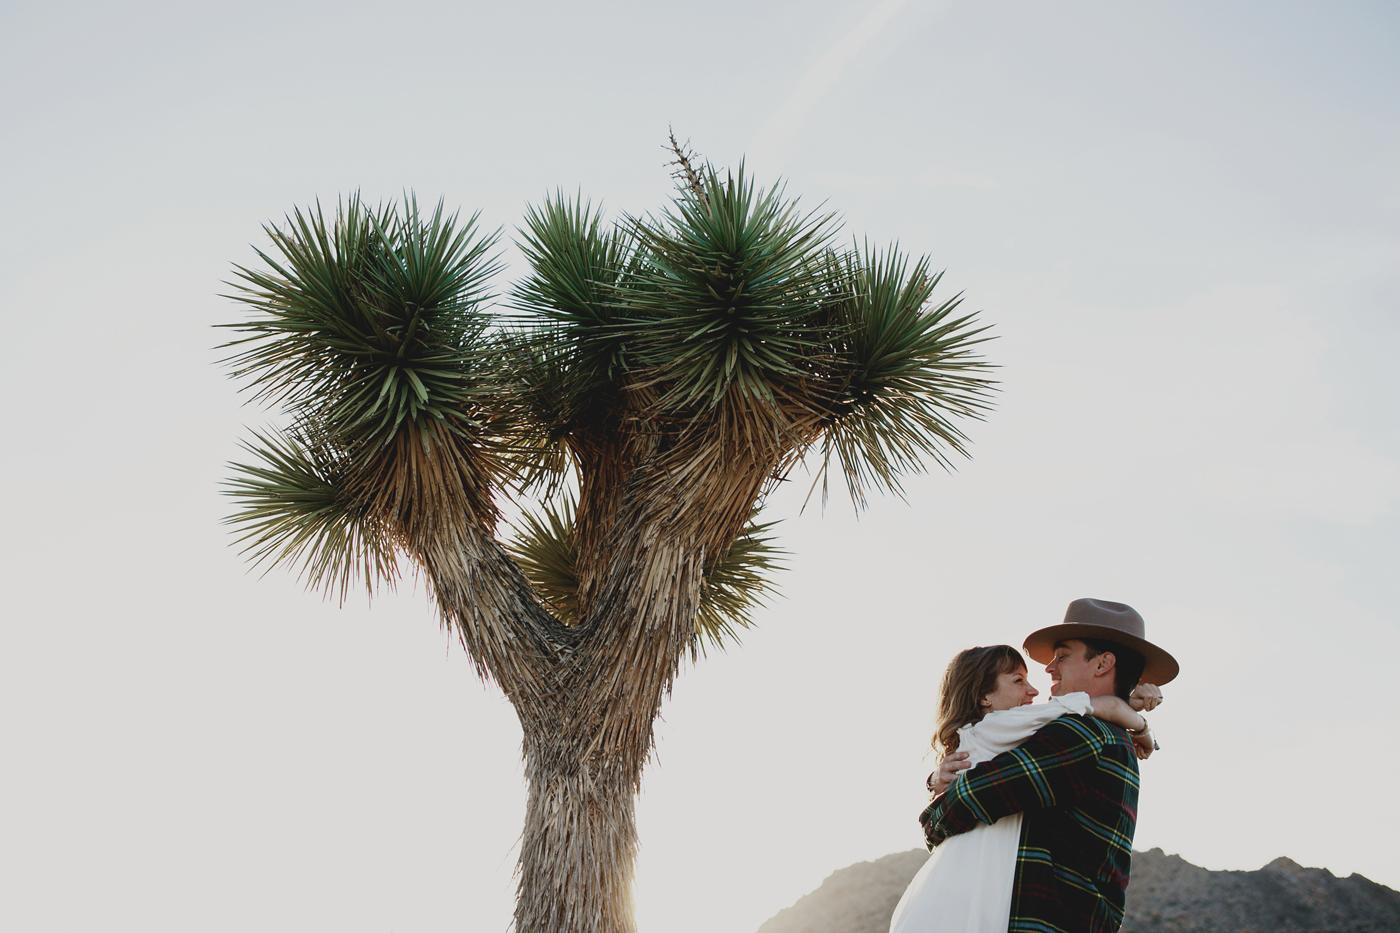 joshua_tree_engagement_005